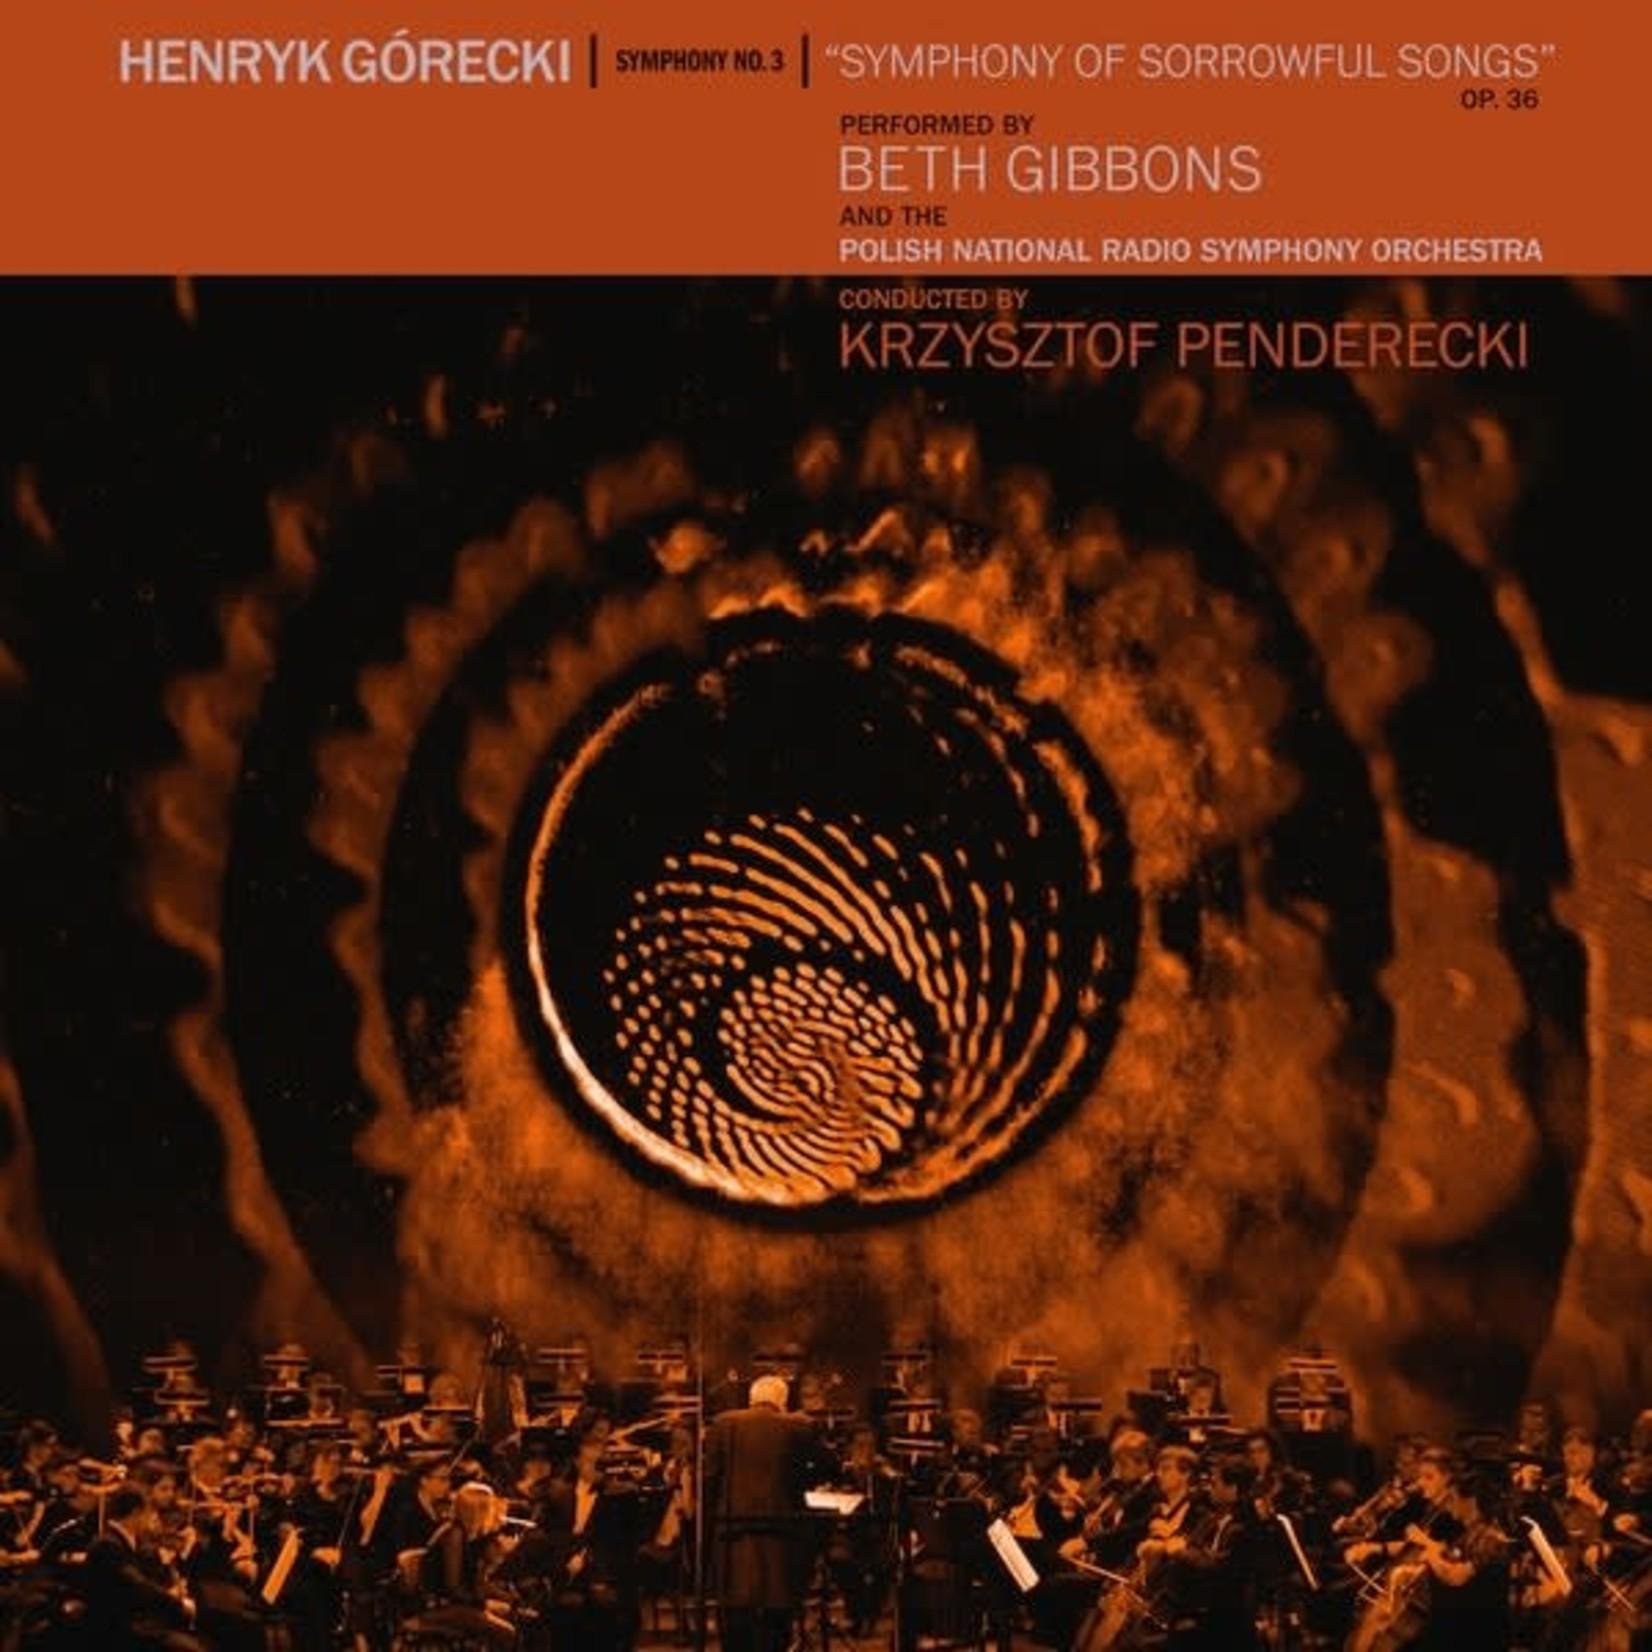 [New] Gibbons, Beth (Portishead): Henryk Gorecki: Symphony No.3 (Symphony Of Sorrowful Songs) Op.36